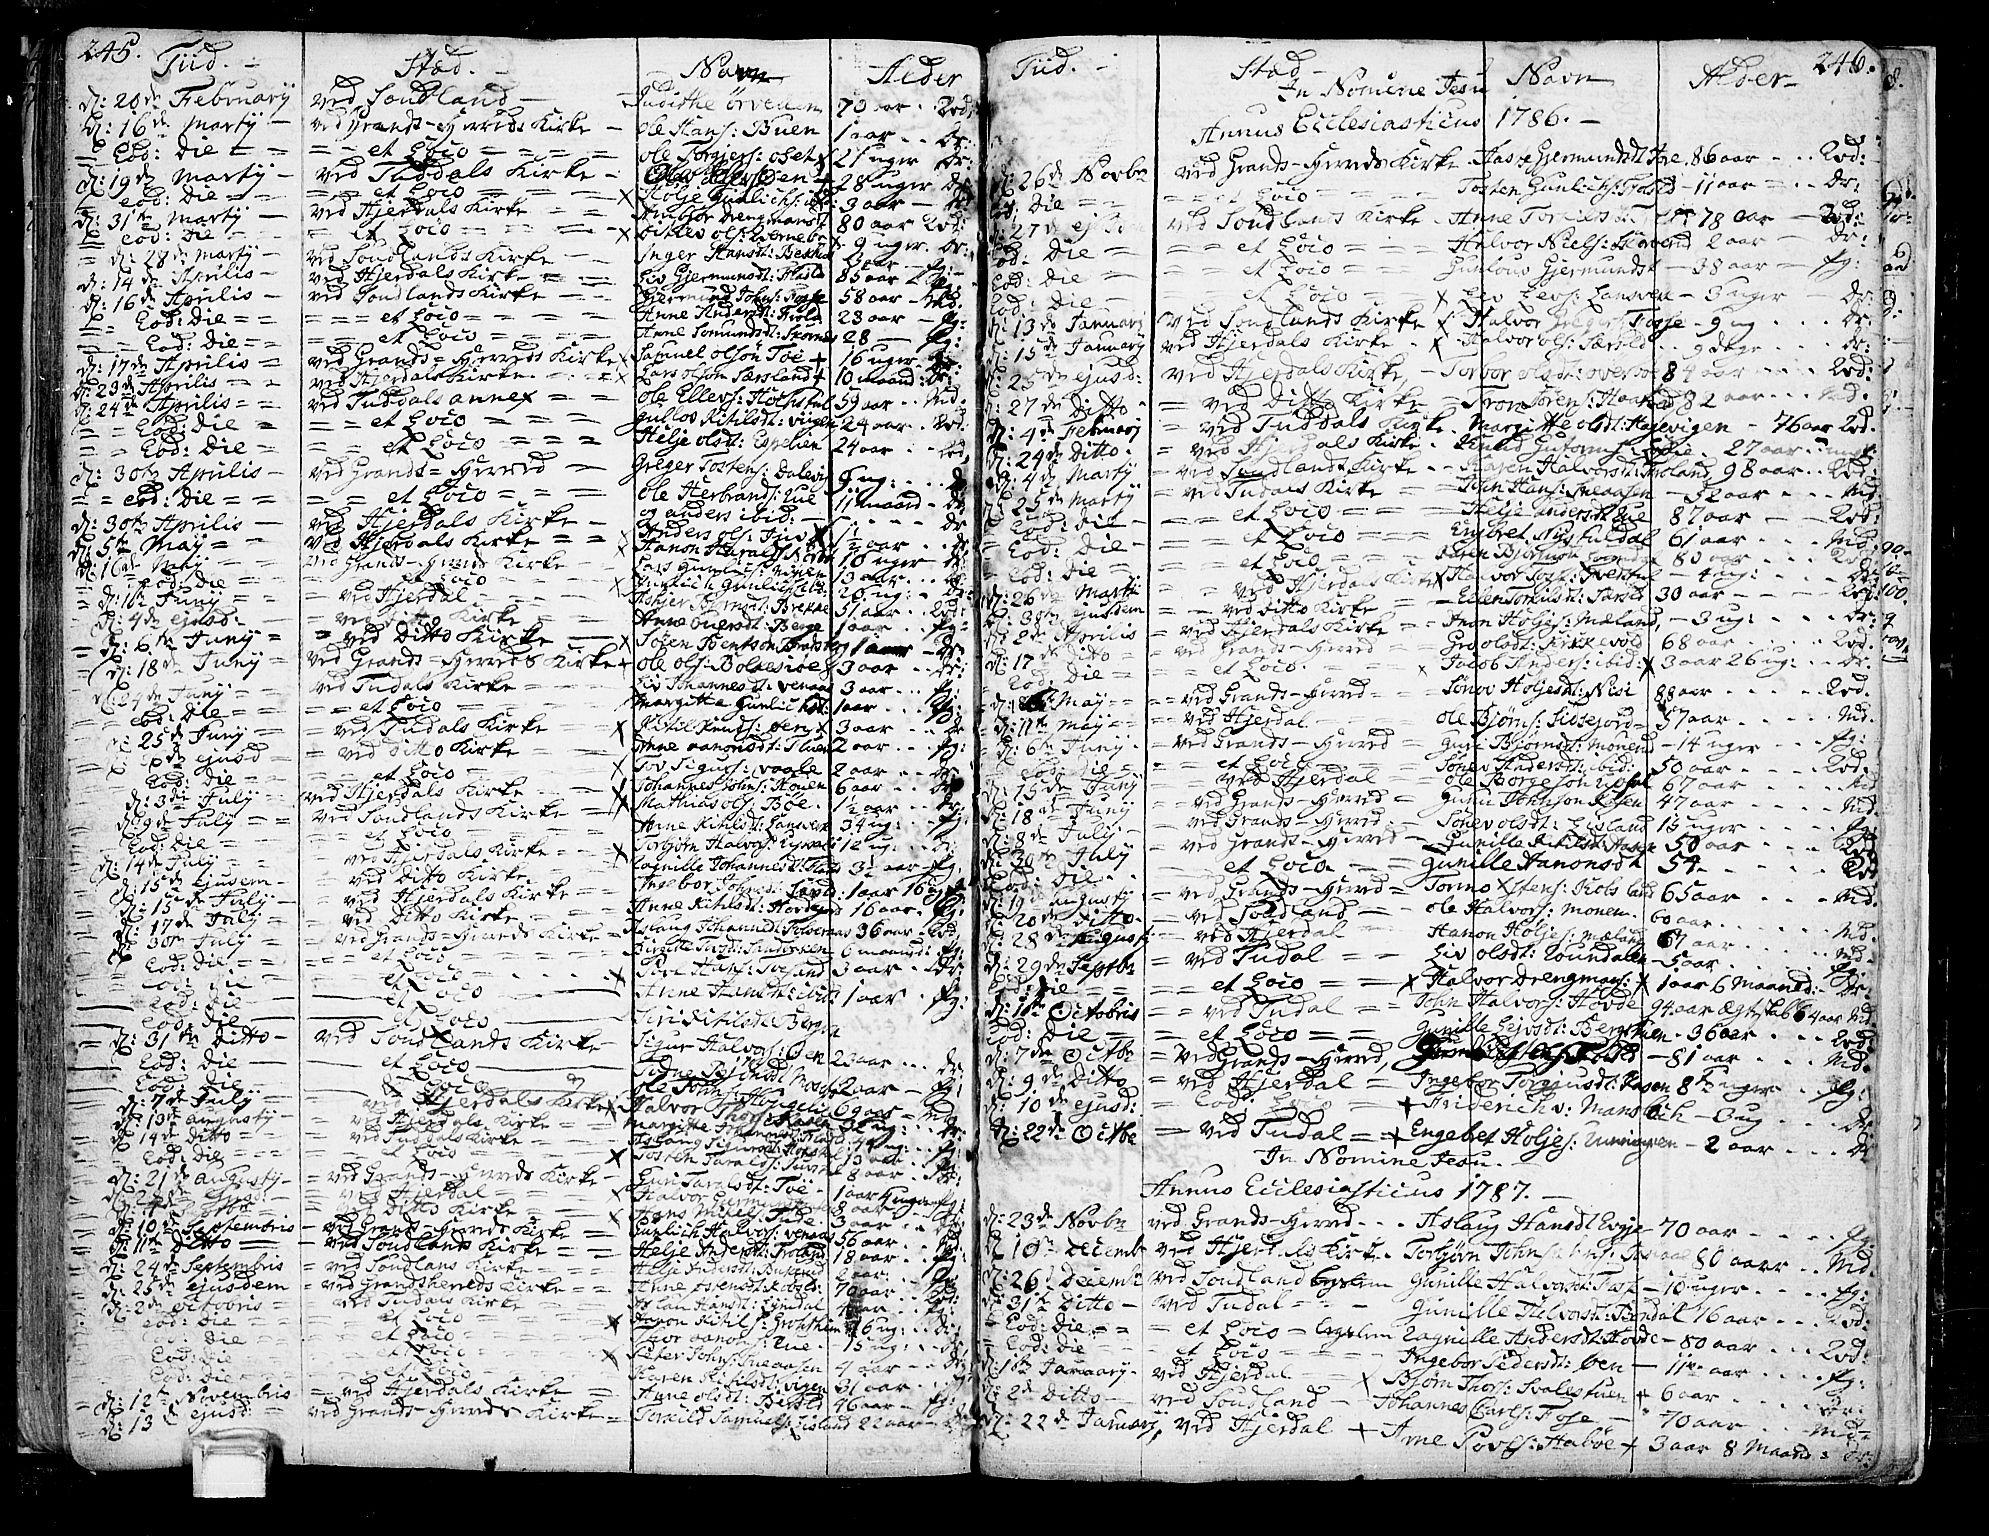 SAKO, Hjartdal kirkebøker, F/Fa/L0005: Ministerialbok nr. I 5, 1776-1801, s. 245-246